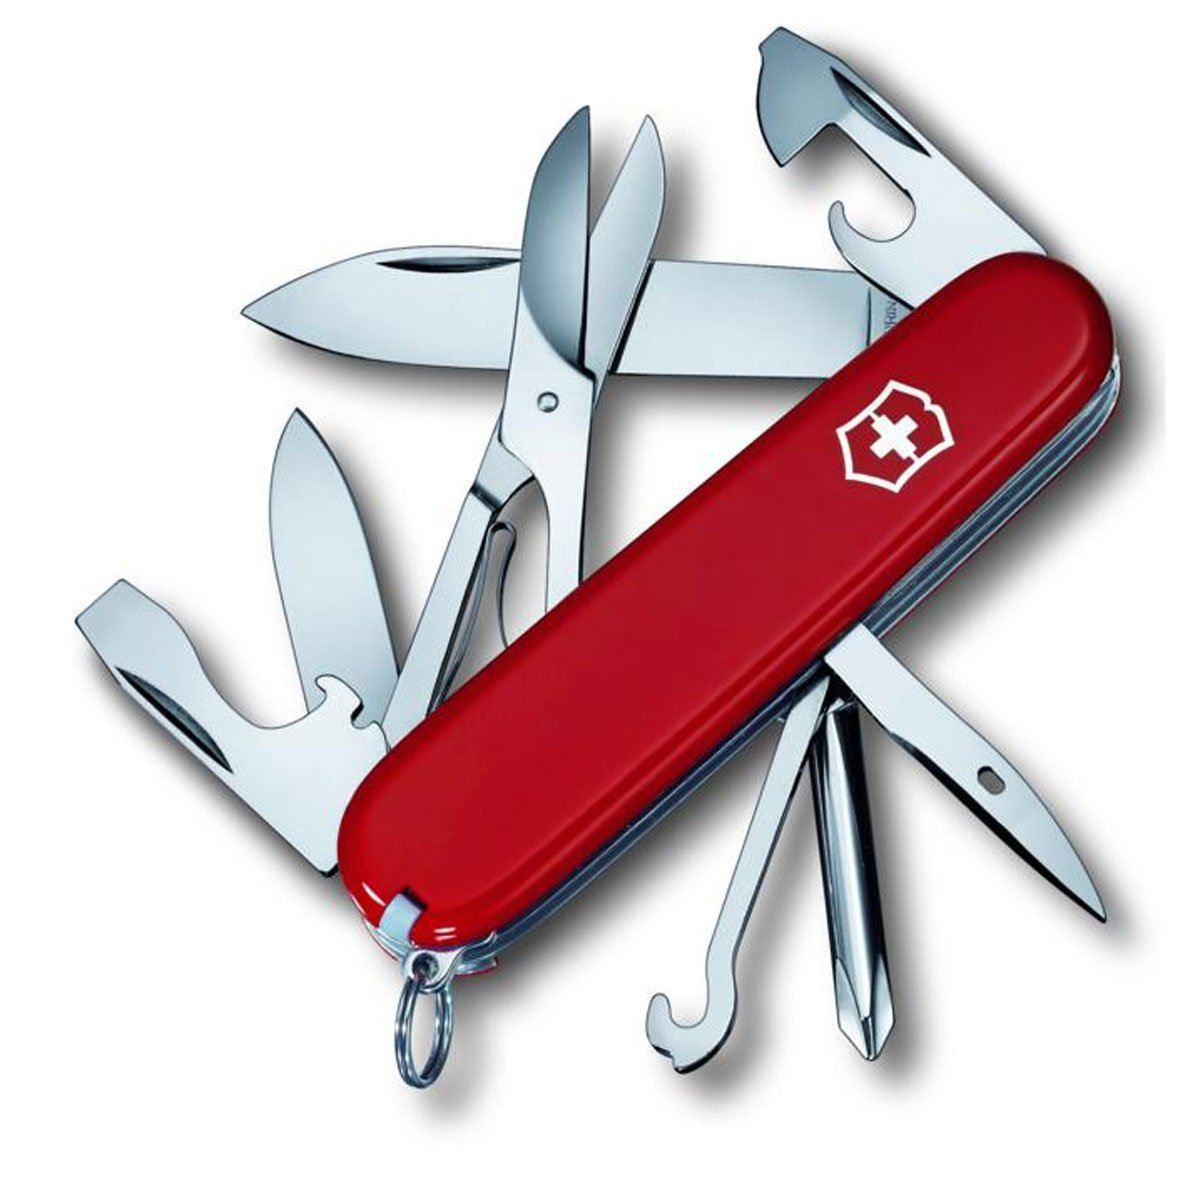 Victorinox Swiss Army Super Tinker Pocket Knife, Red,91mm